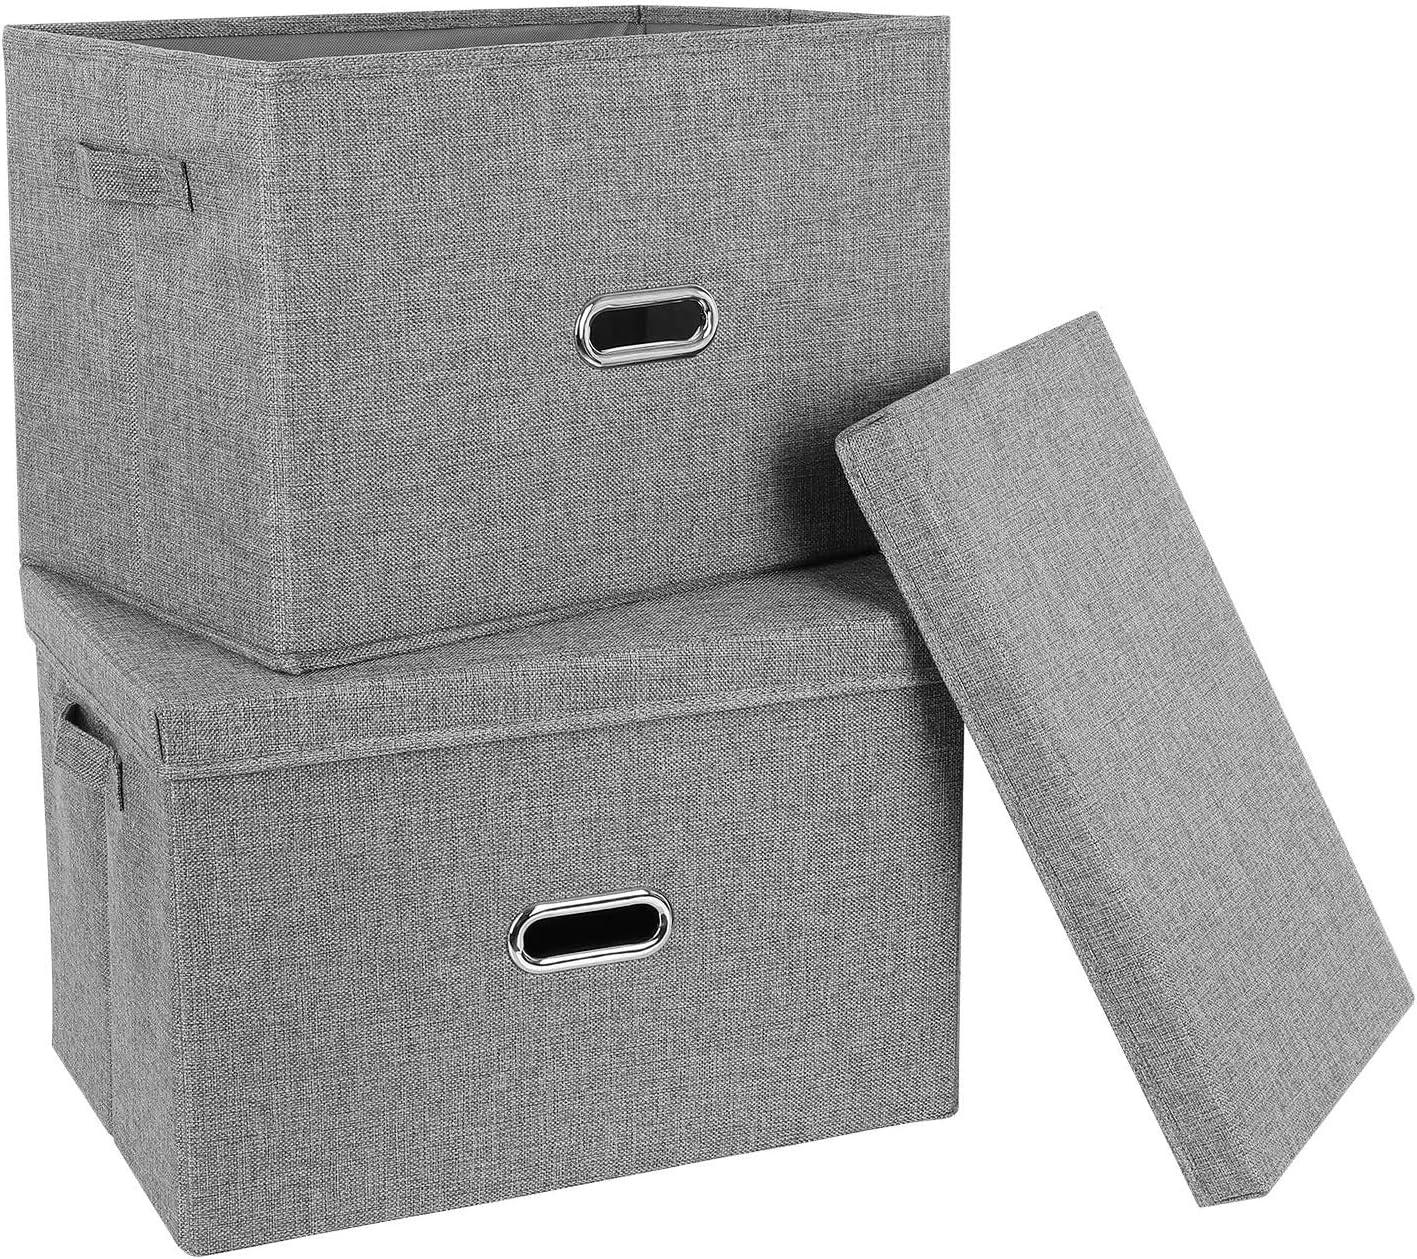 Homfa 2Pcs Organizador de Cajones Cajas de Almacenaje Plegable con Tapa Manija Anillo de Tiro para Sujetadores Bragas Calcetines Gris 44.5x29x29.5cm